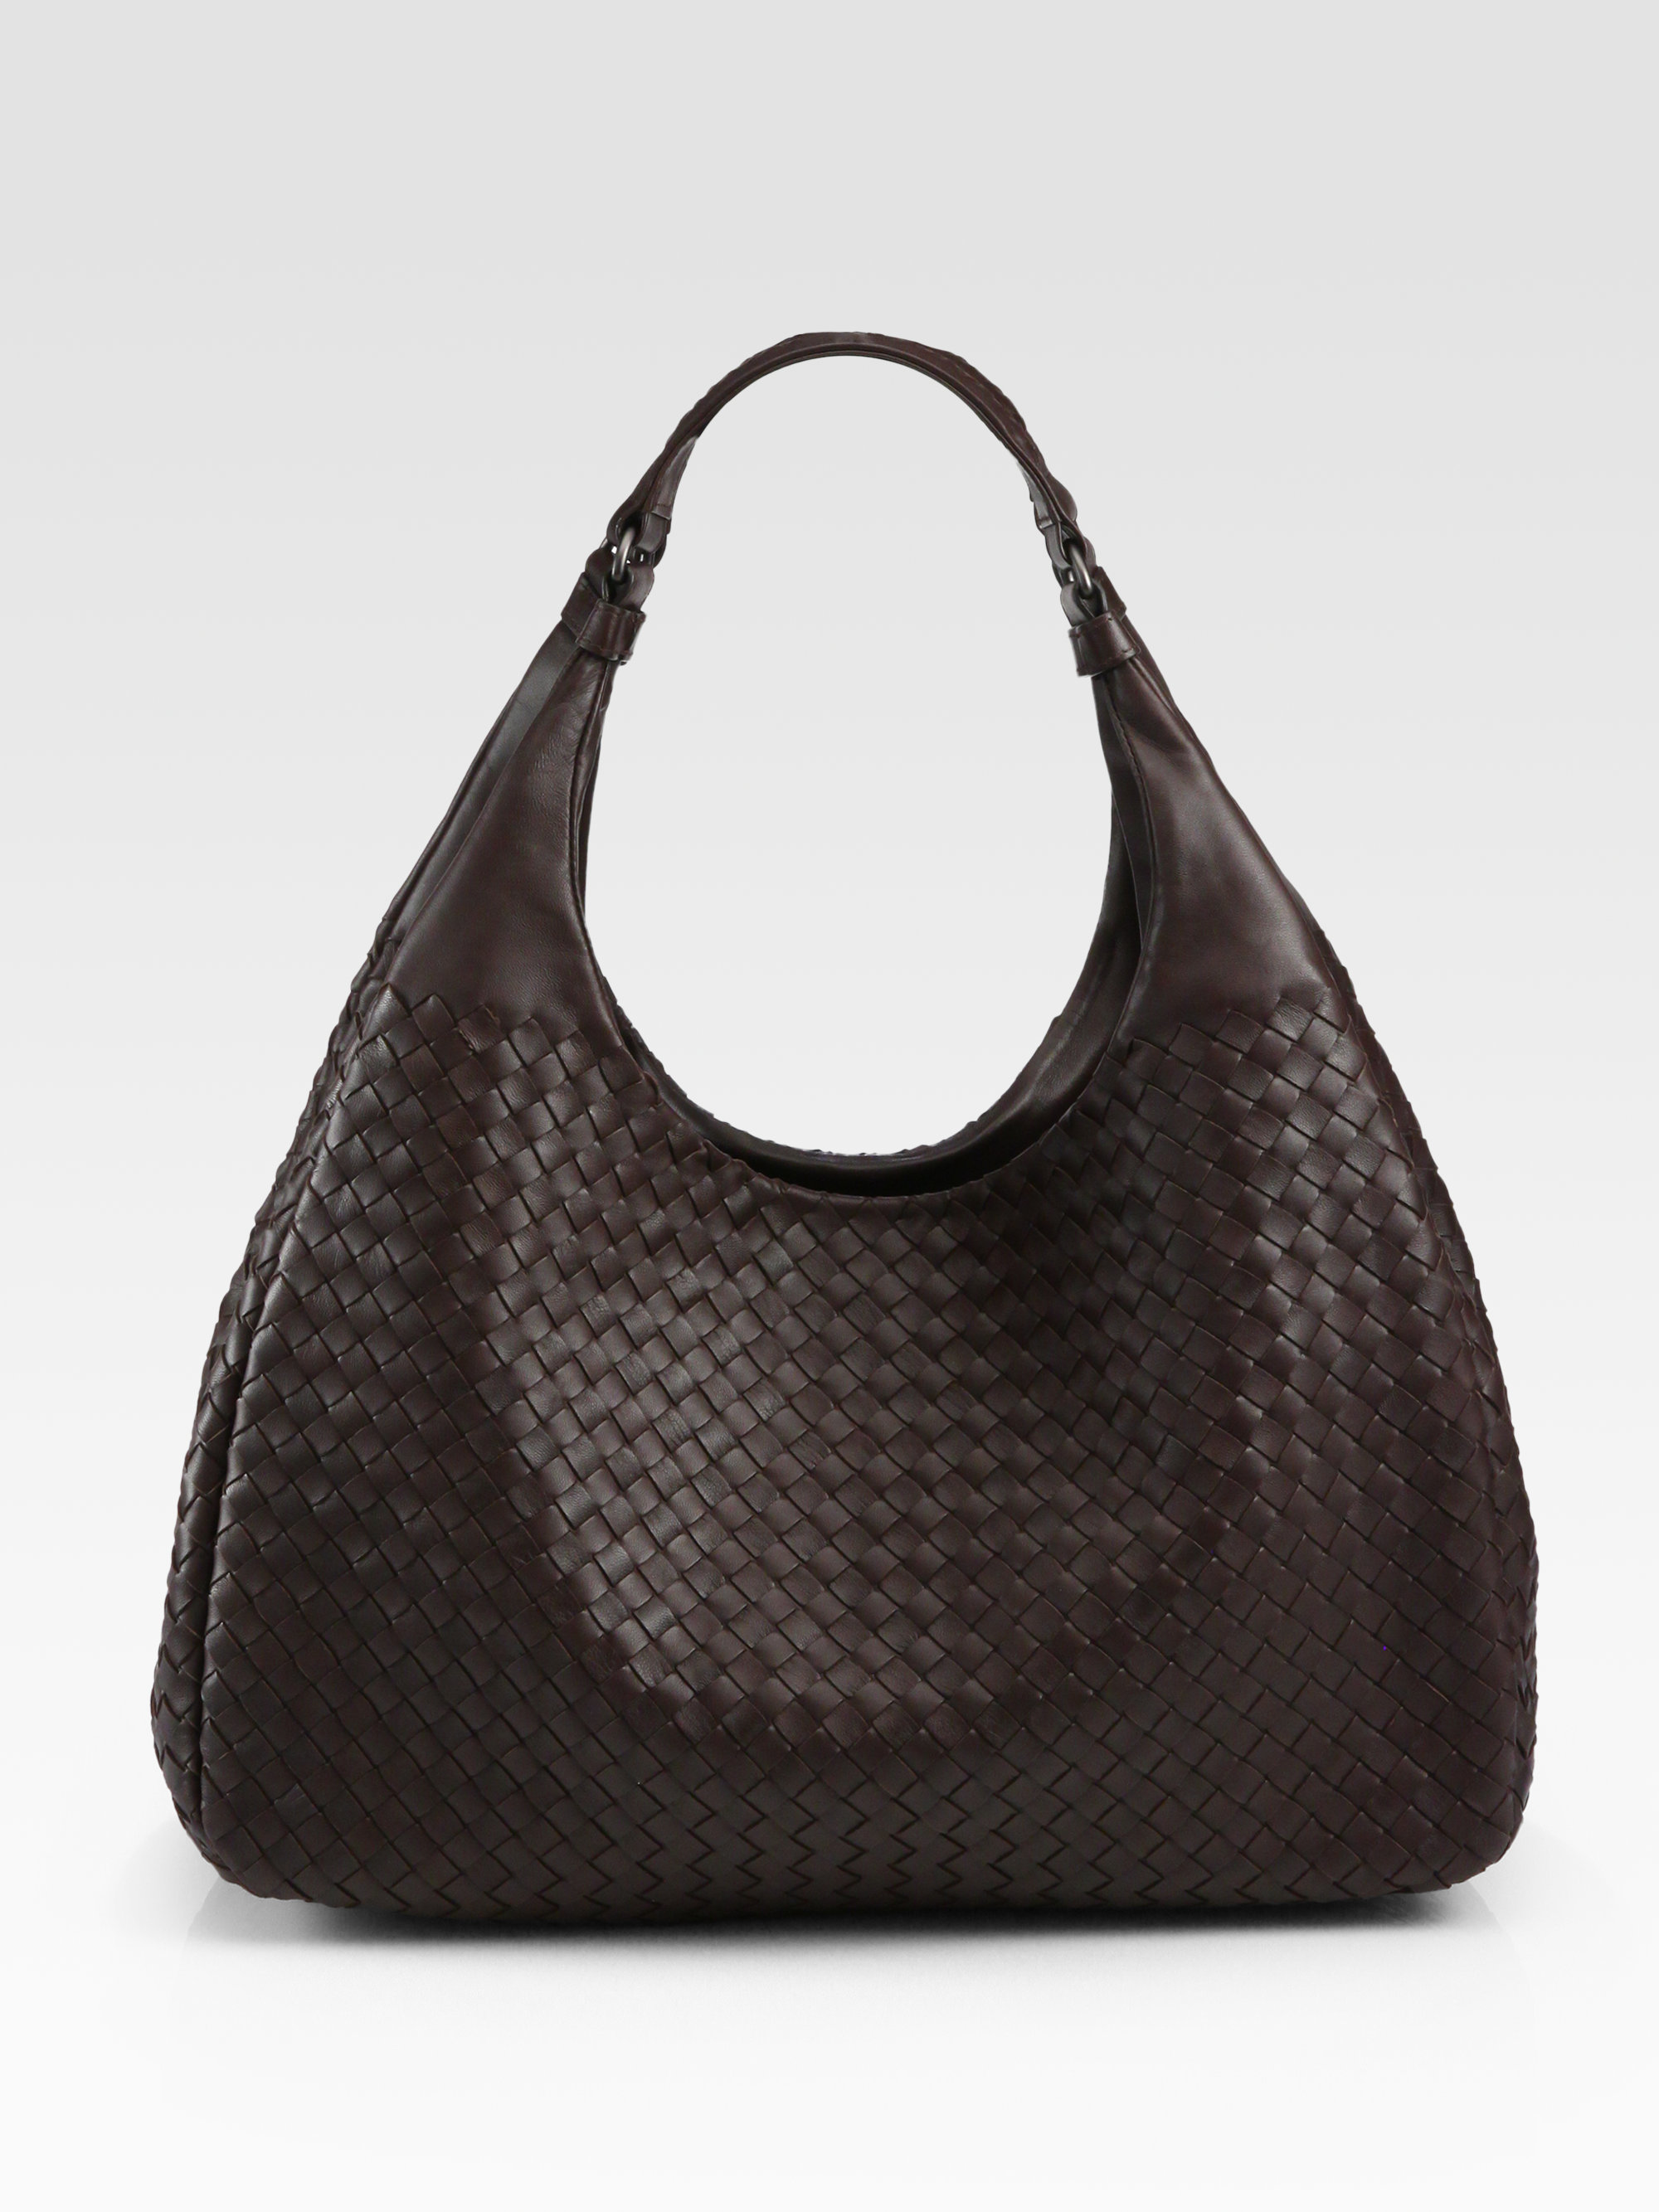 994a6bac99c7 Lyst - Bottega Veneta Large Campana Hobo Bag in Brown